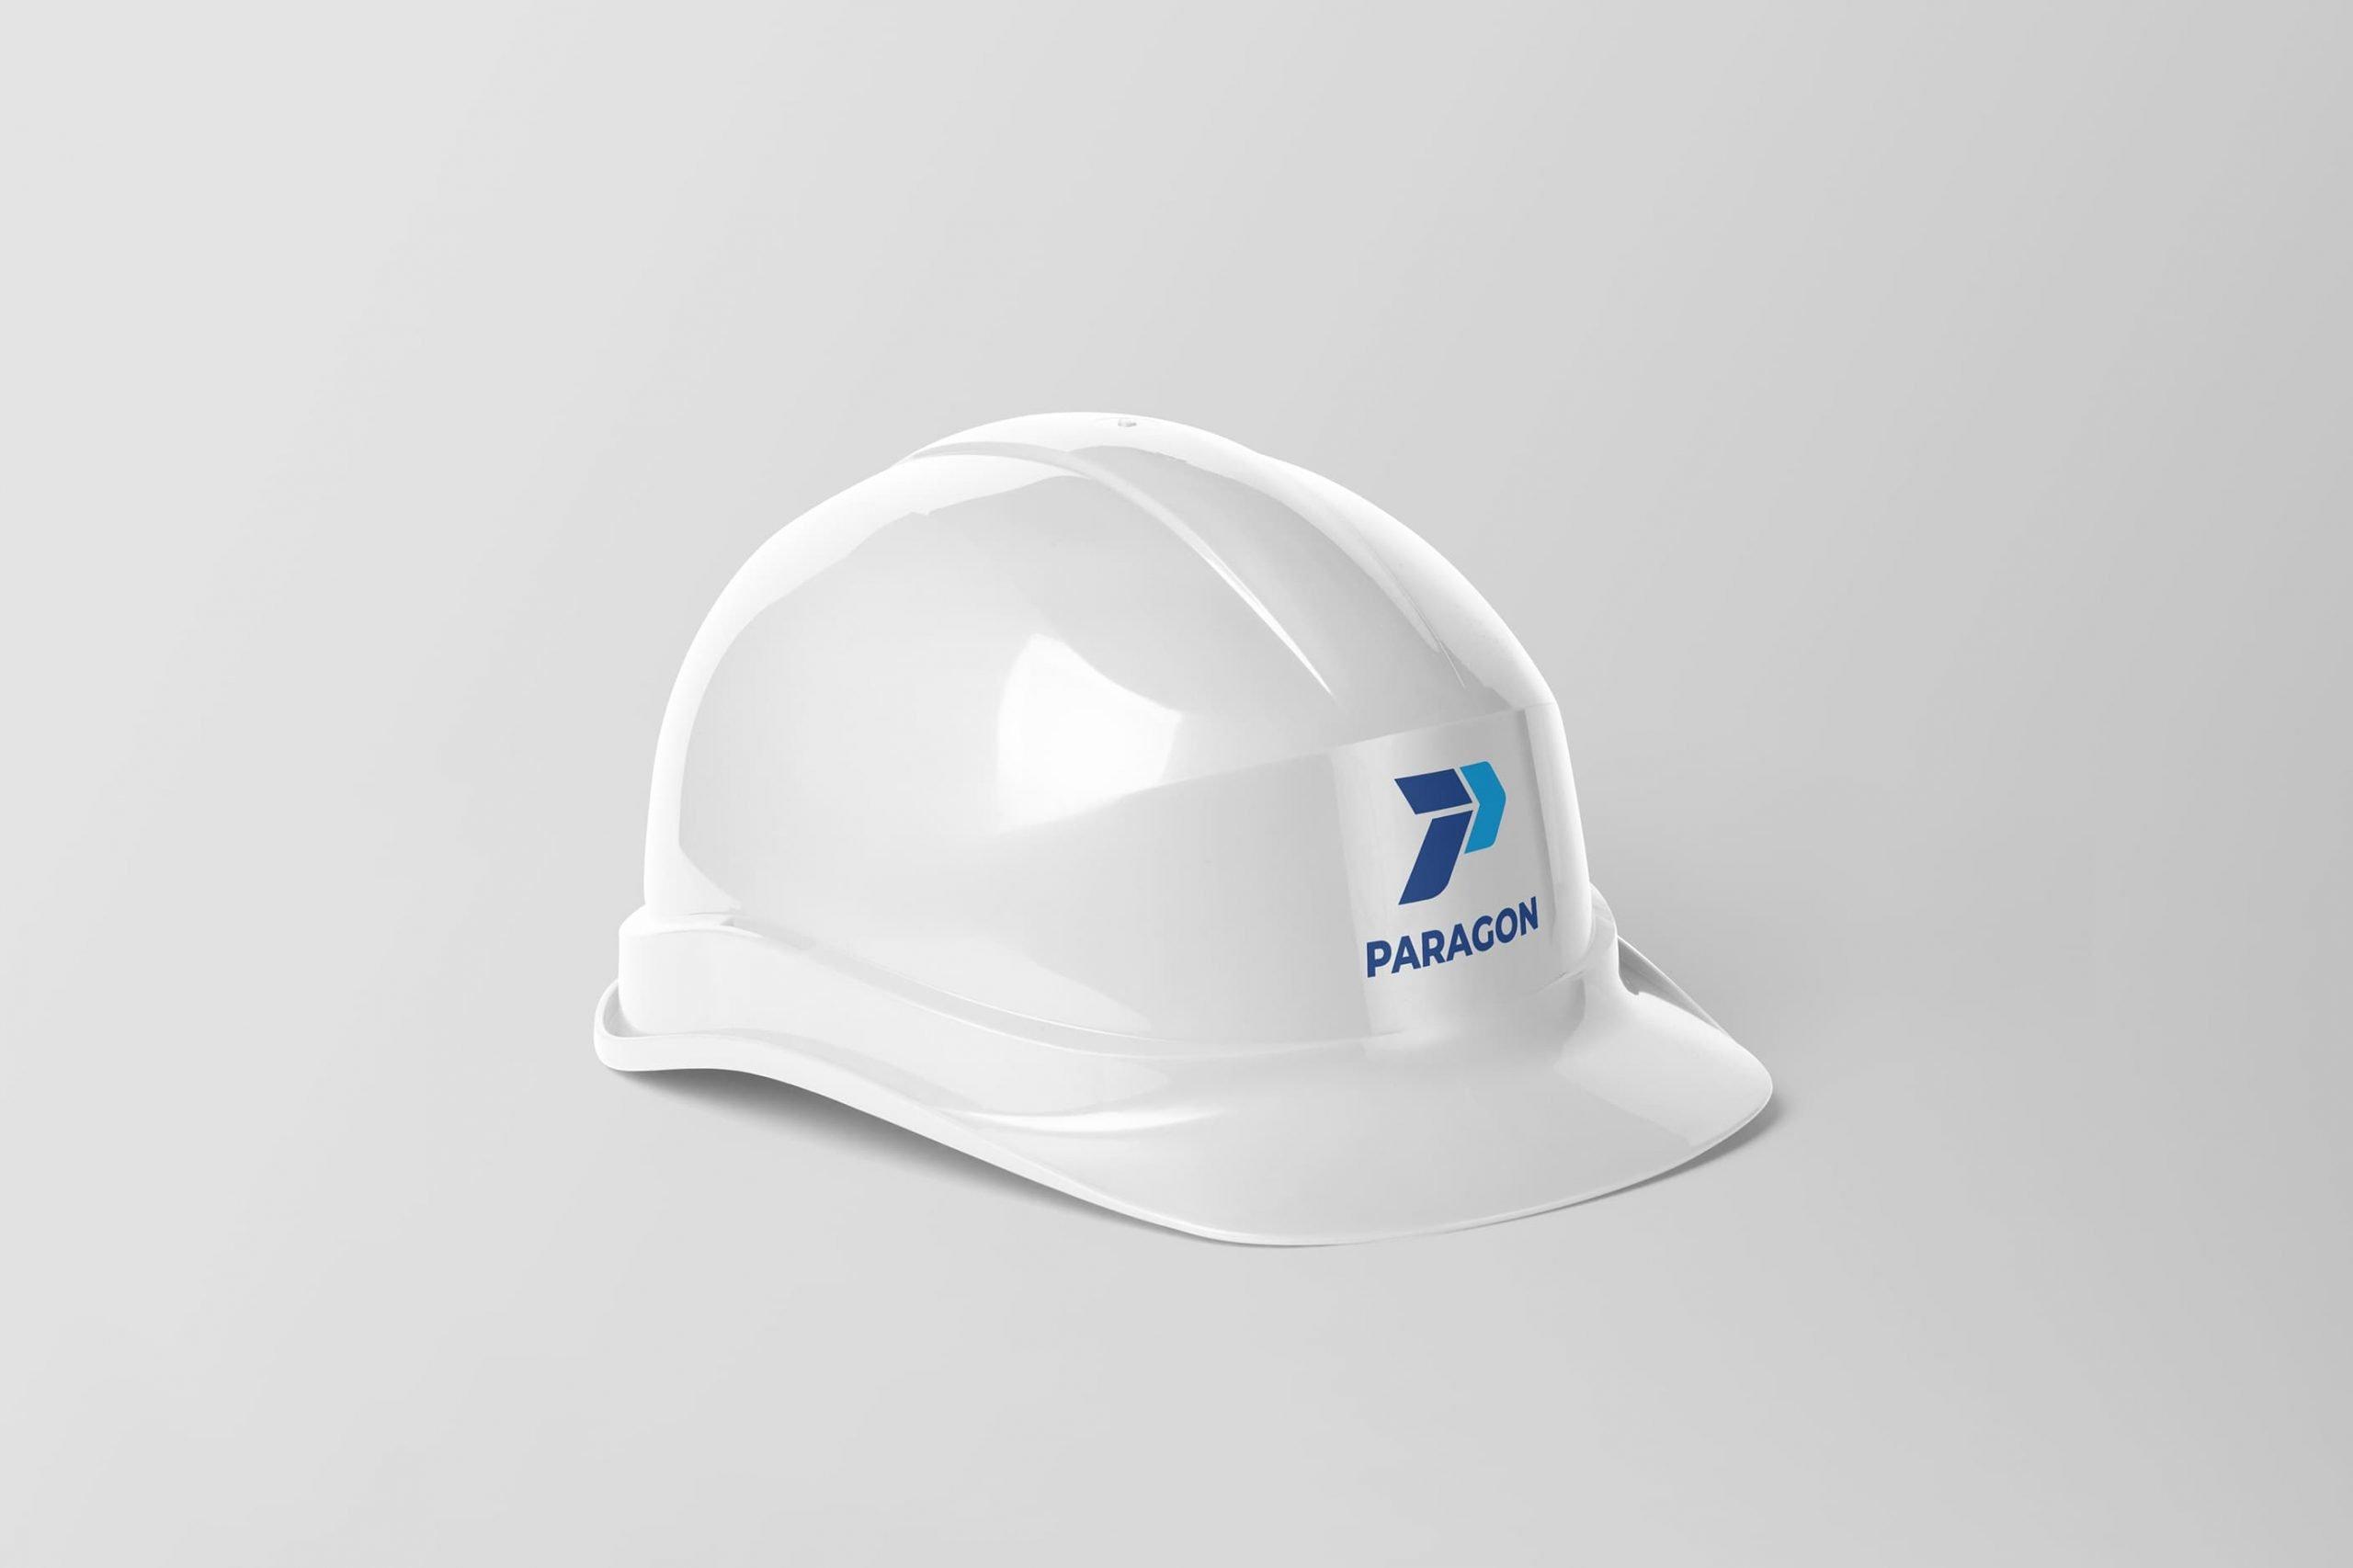 Paragon Hard hat